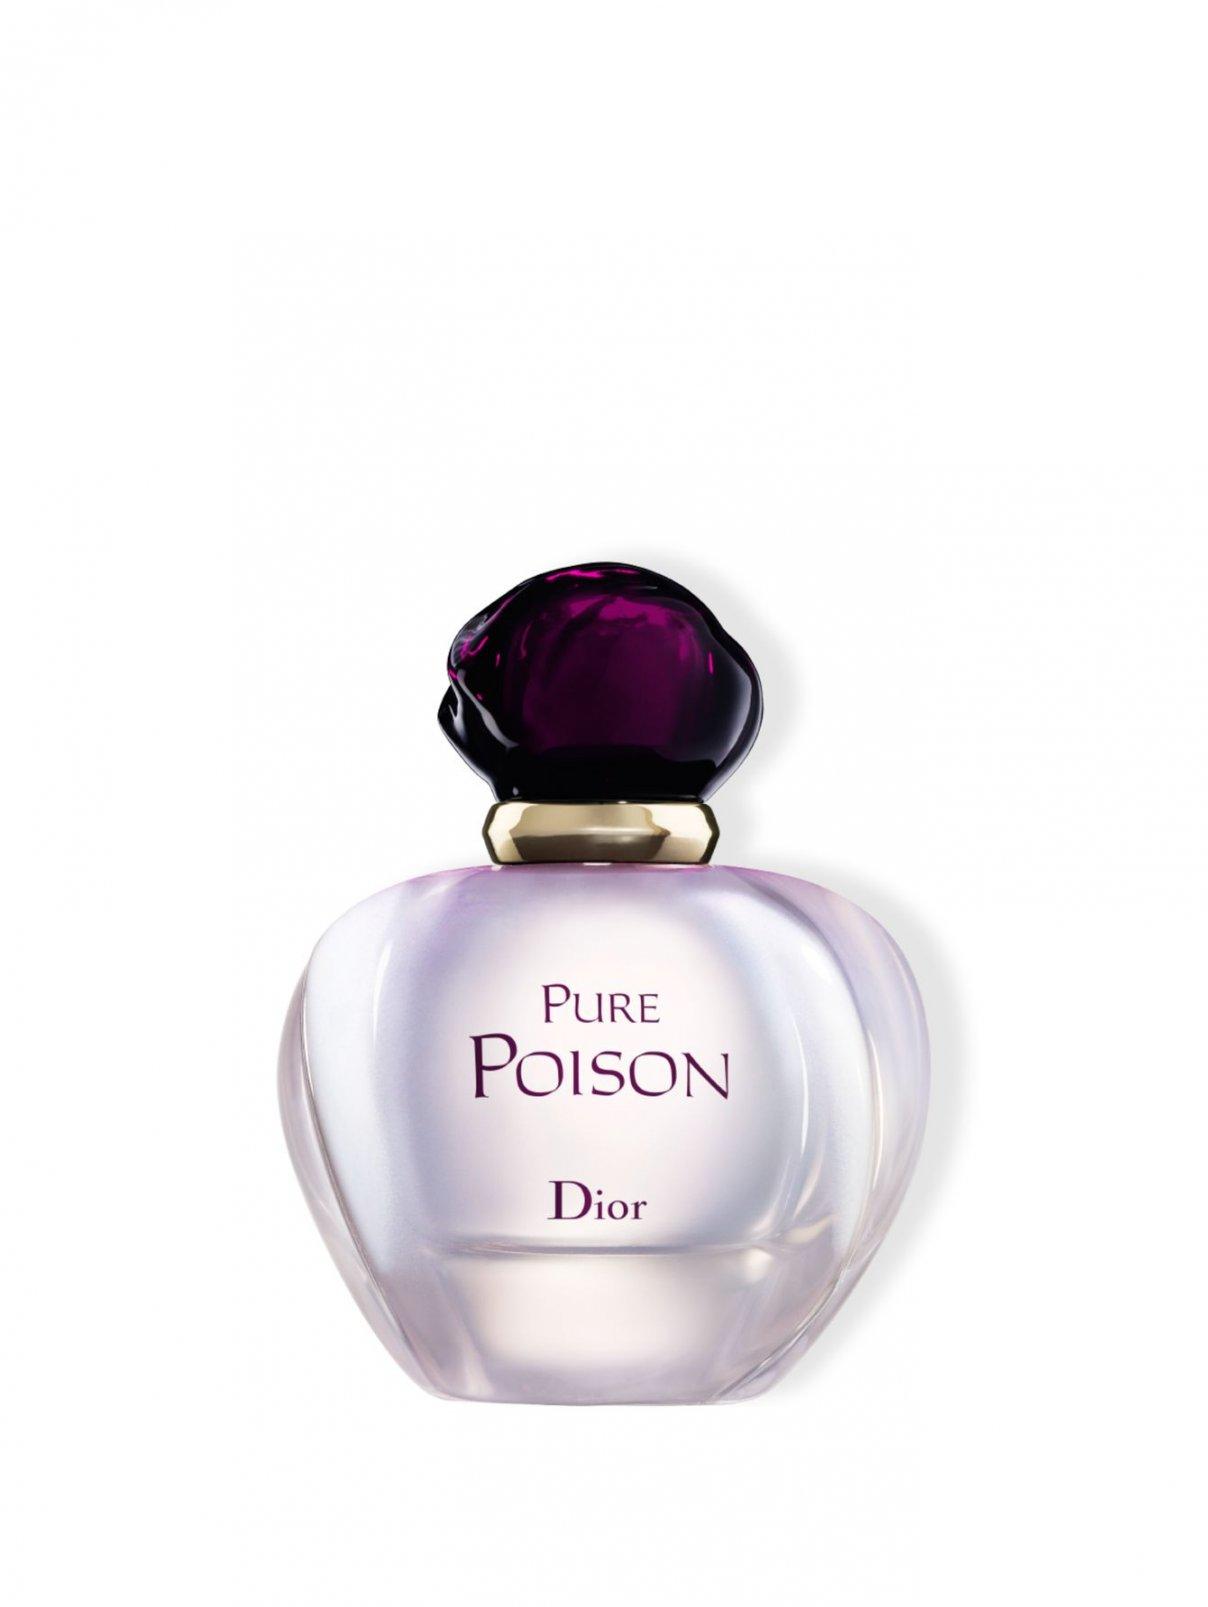 Парфюмерная вода 50 мл Pure Poison Dior  –  Общий вид